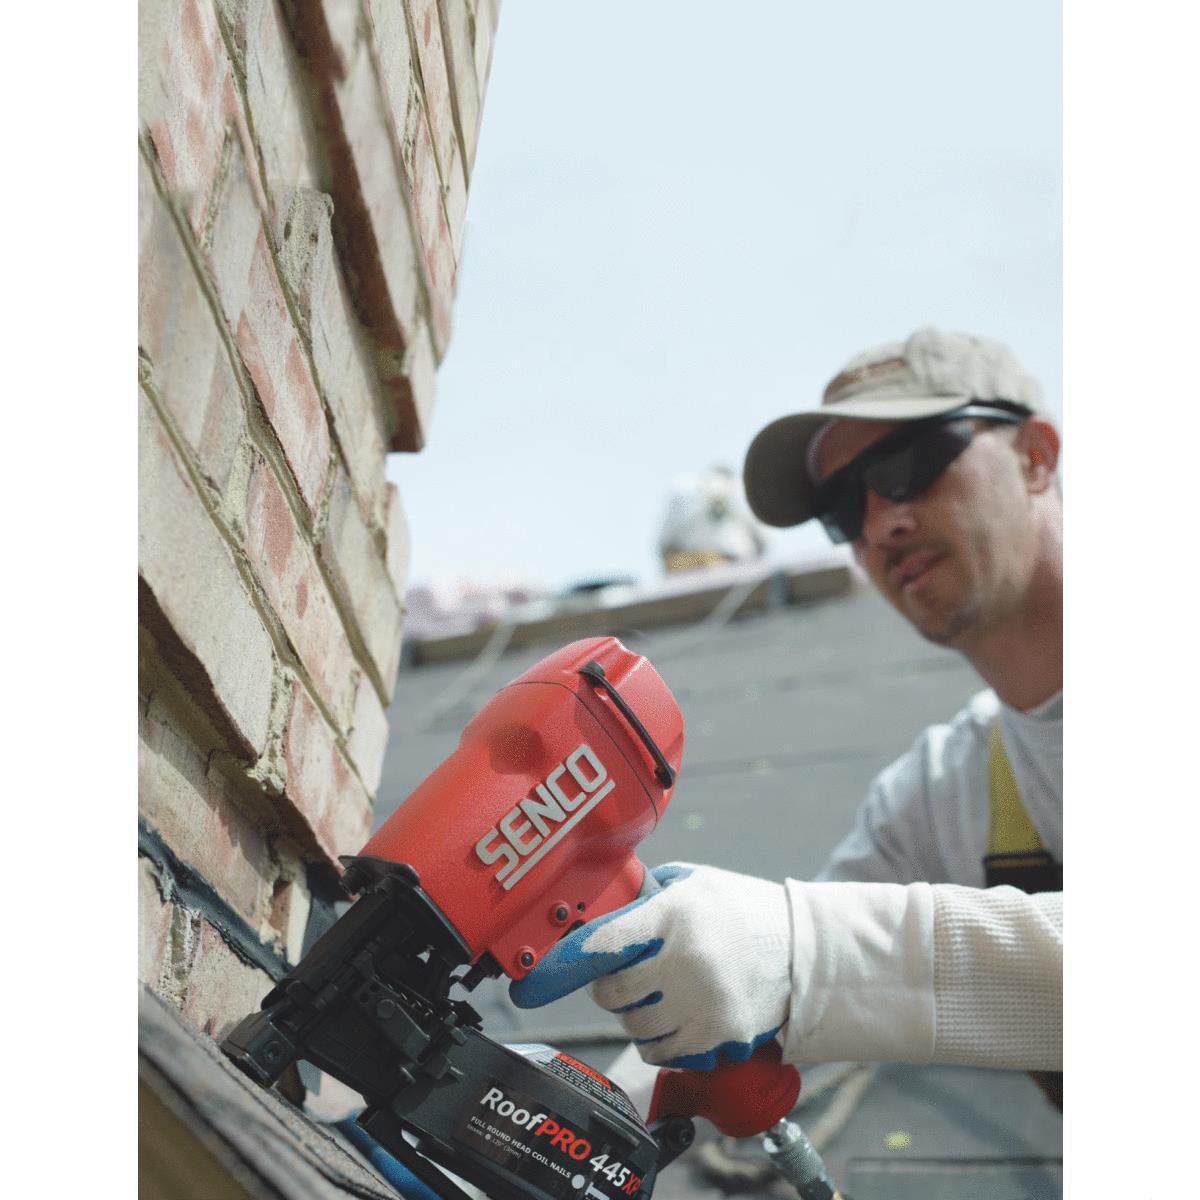 Senco RoofPro 445XP Roofing Nailer